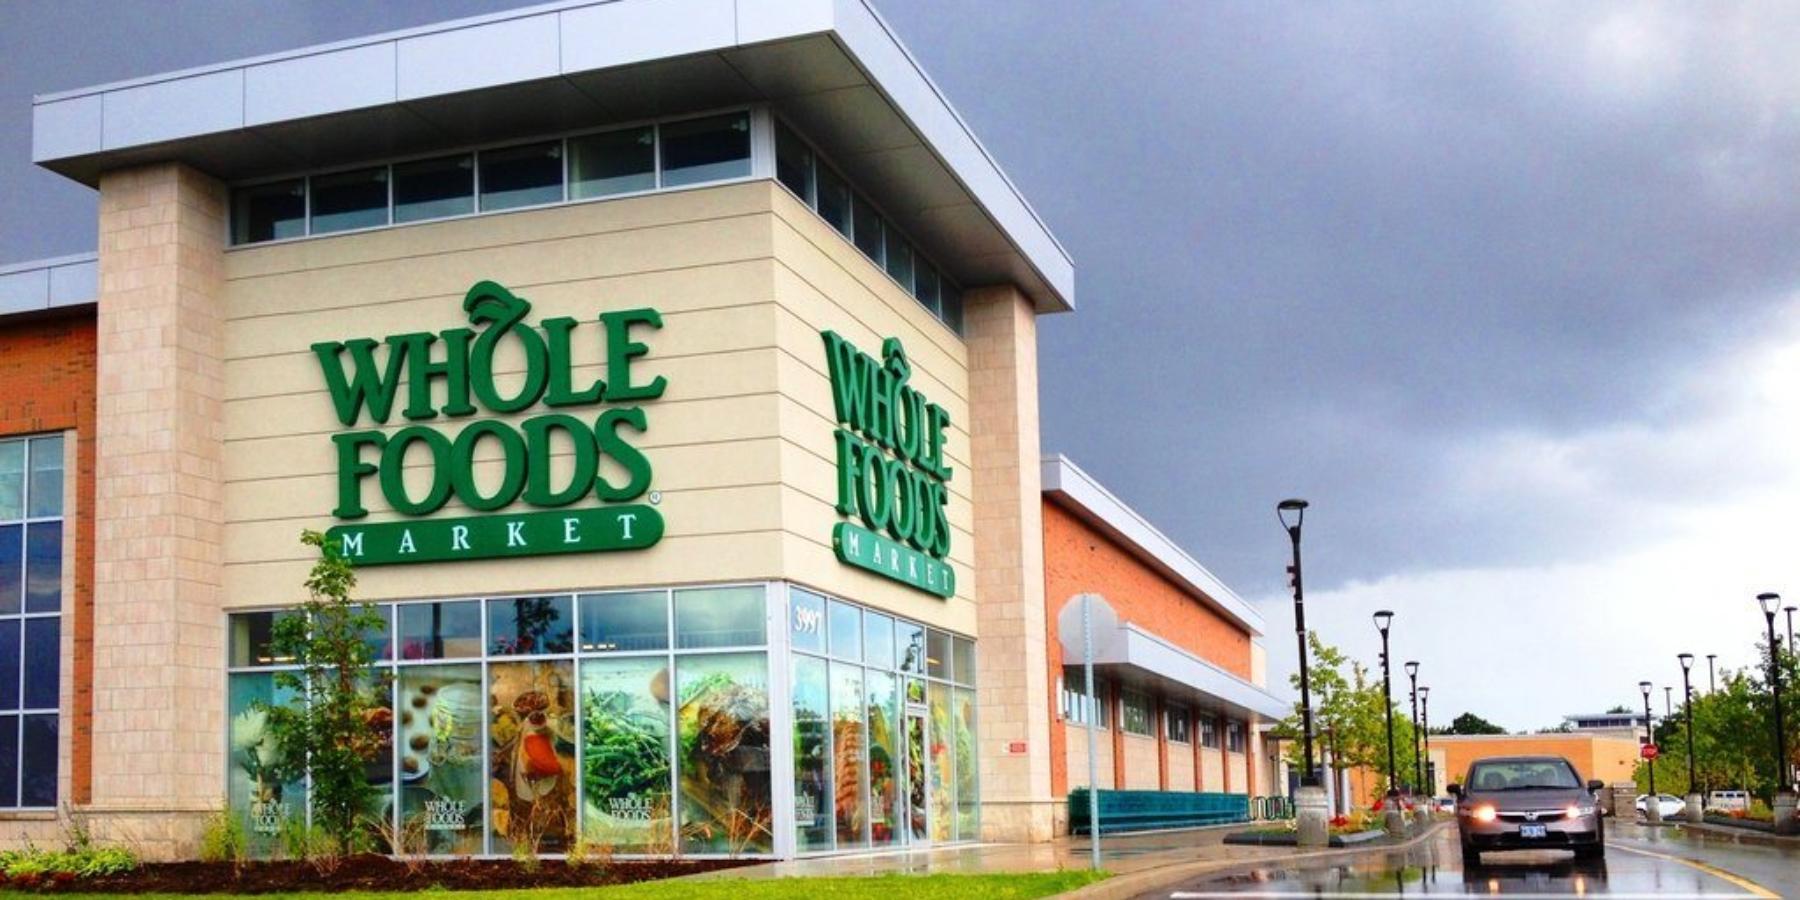 Prasówka e-commerce #28 Amazon kupuje Whole Foods Market za13,7 mld dolarów